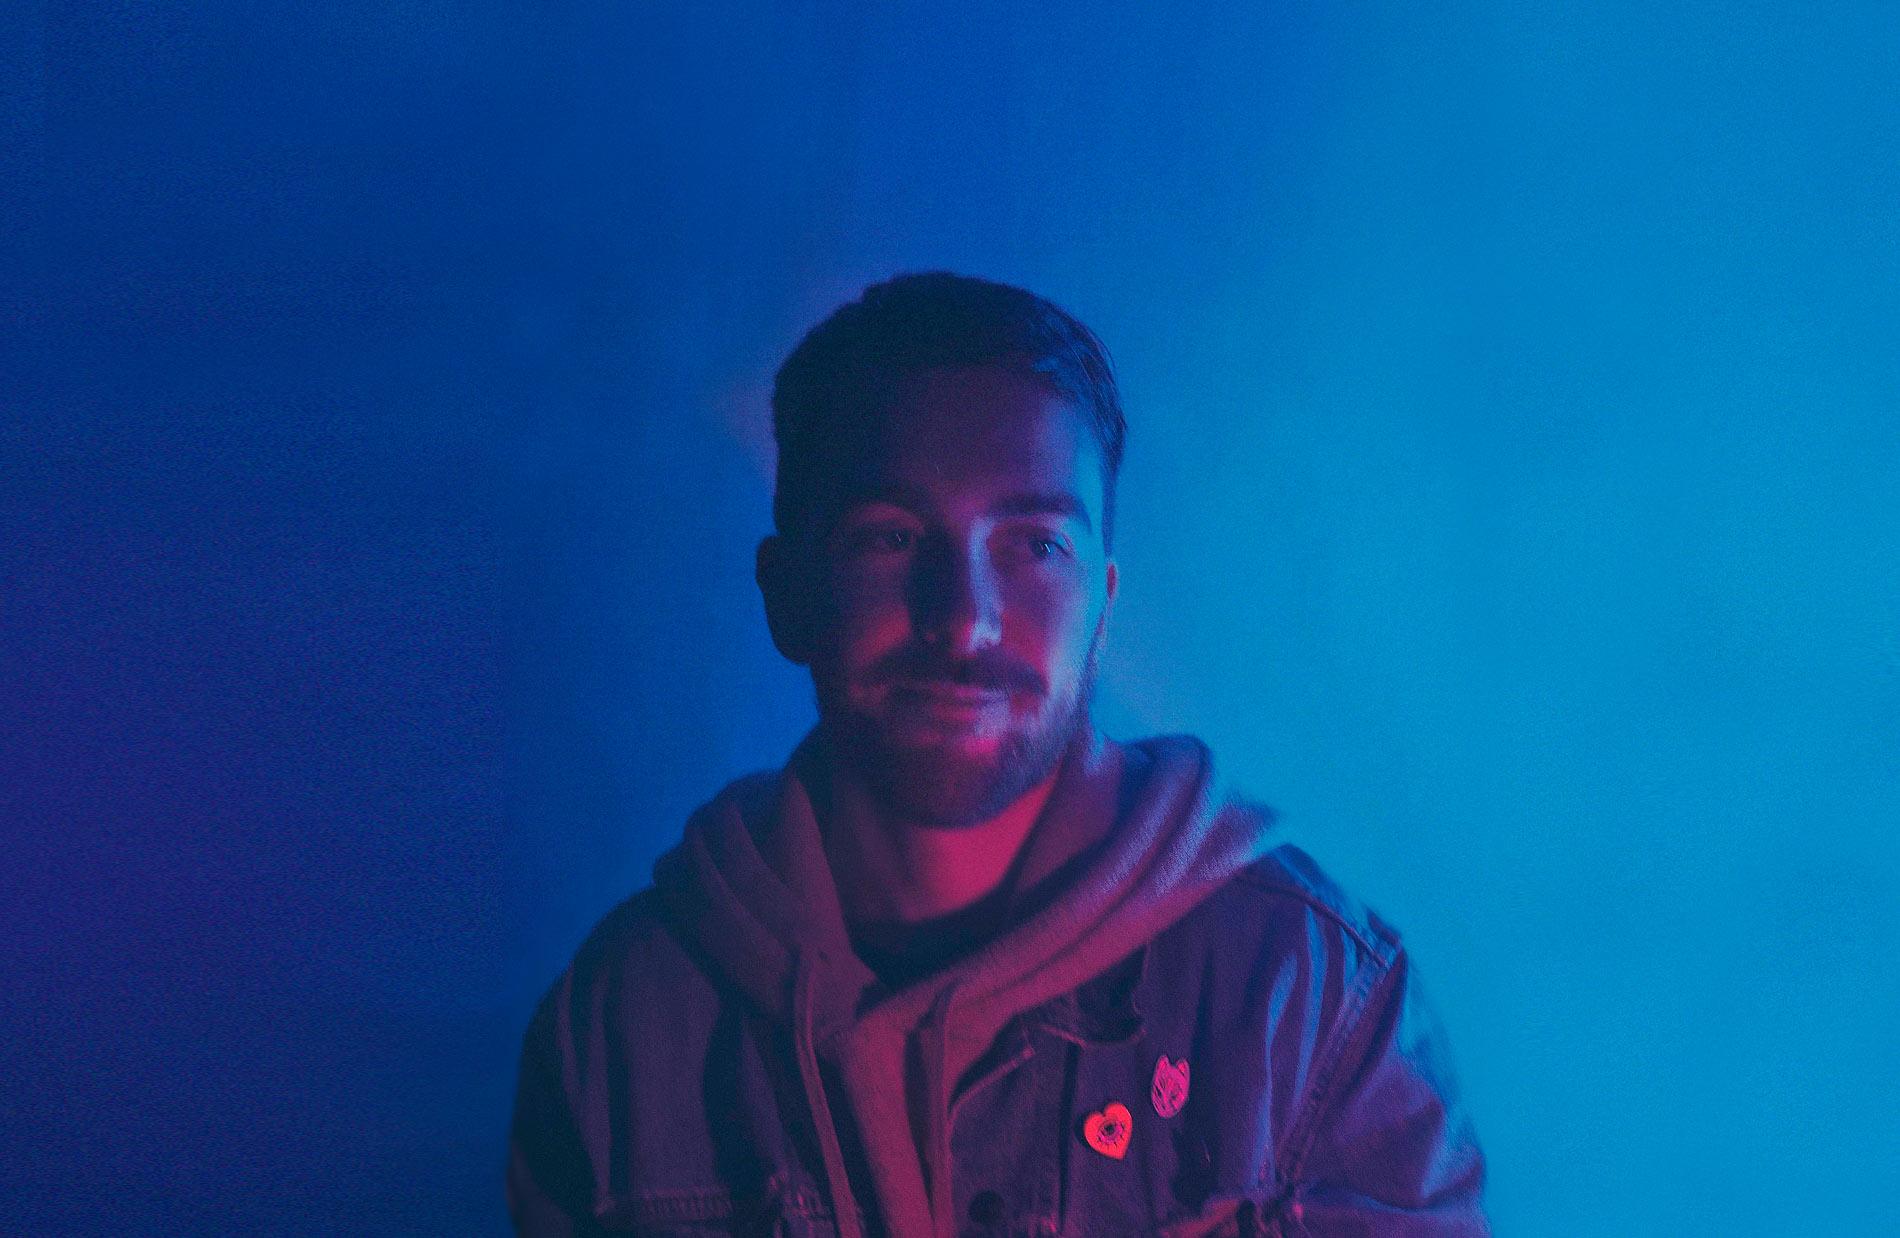 Portrait of Florian Pollet under blue neon lights